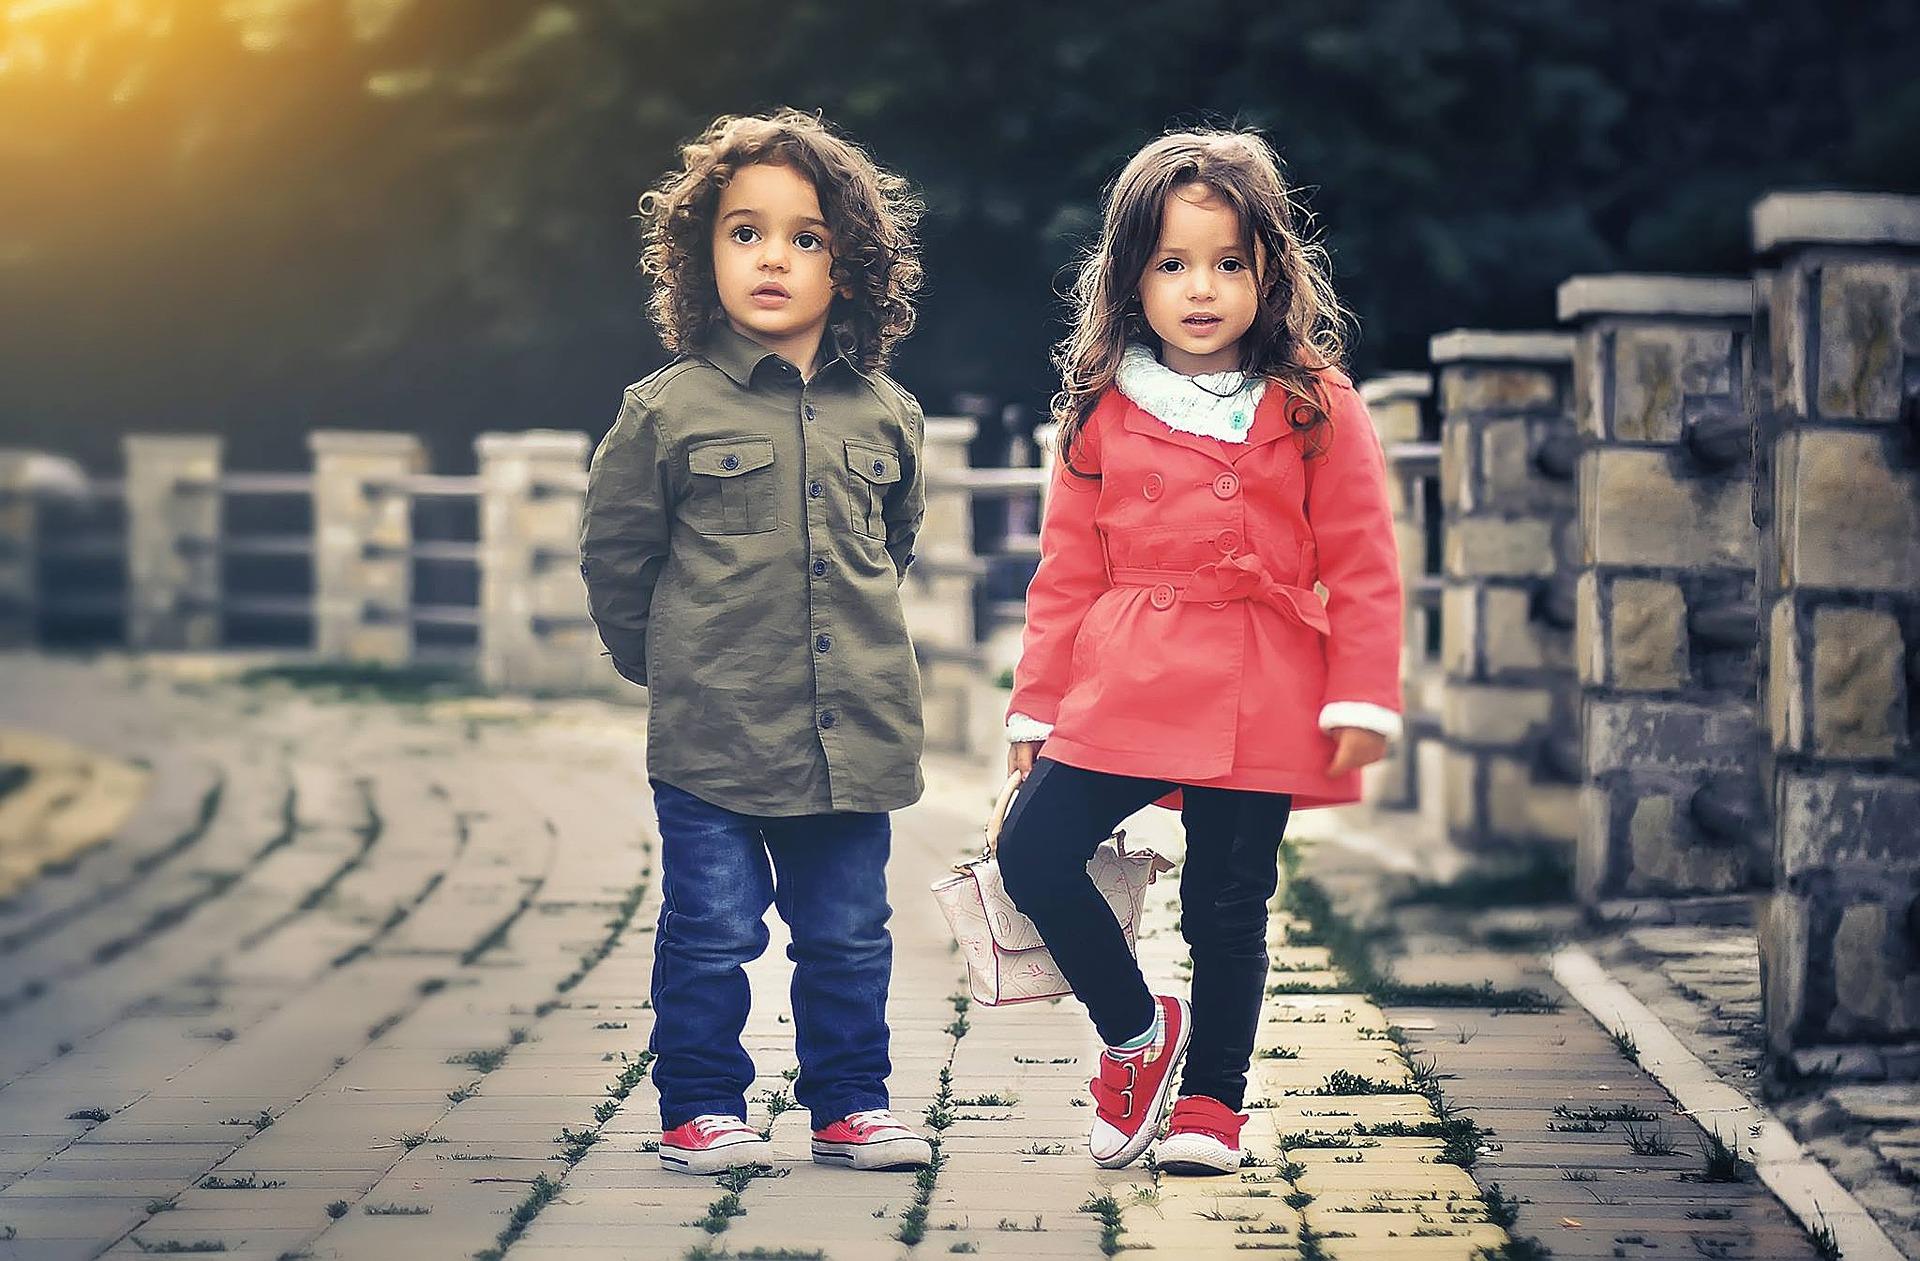 De Leukste Kinderkleding.De 9 Leukste Kinderkleding Webshops In Nederland Mama Praatjes